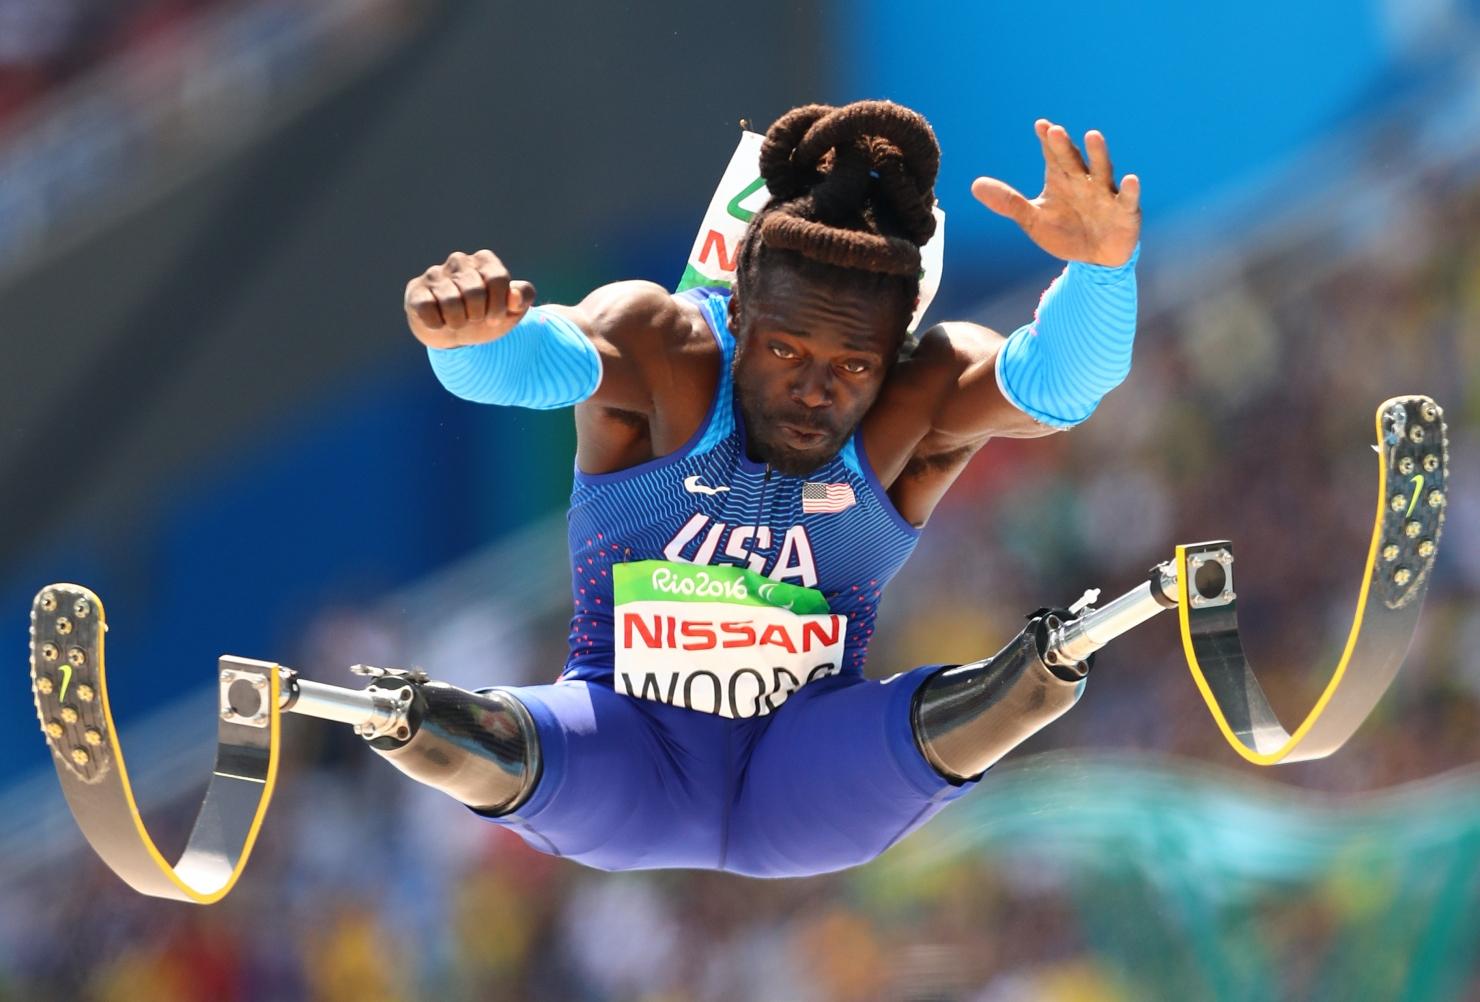 Paralimpici la Rio